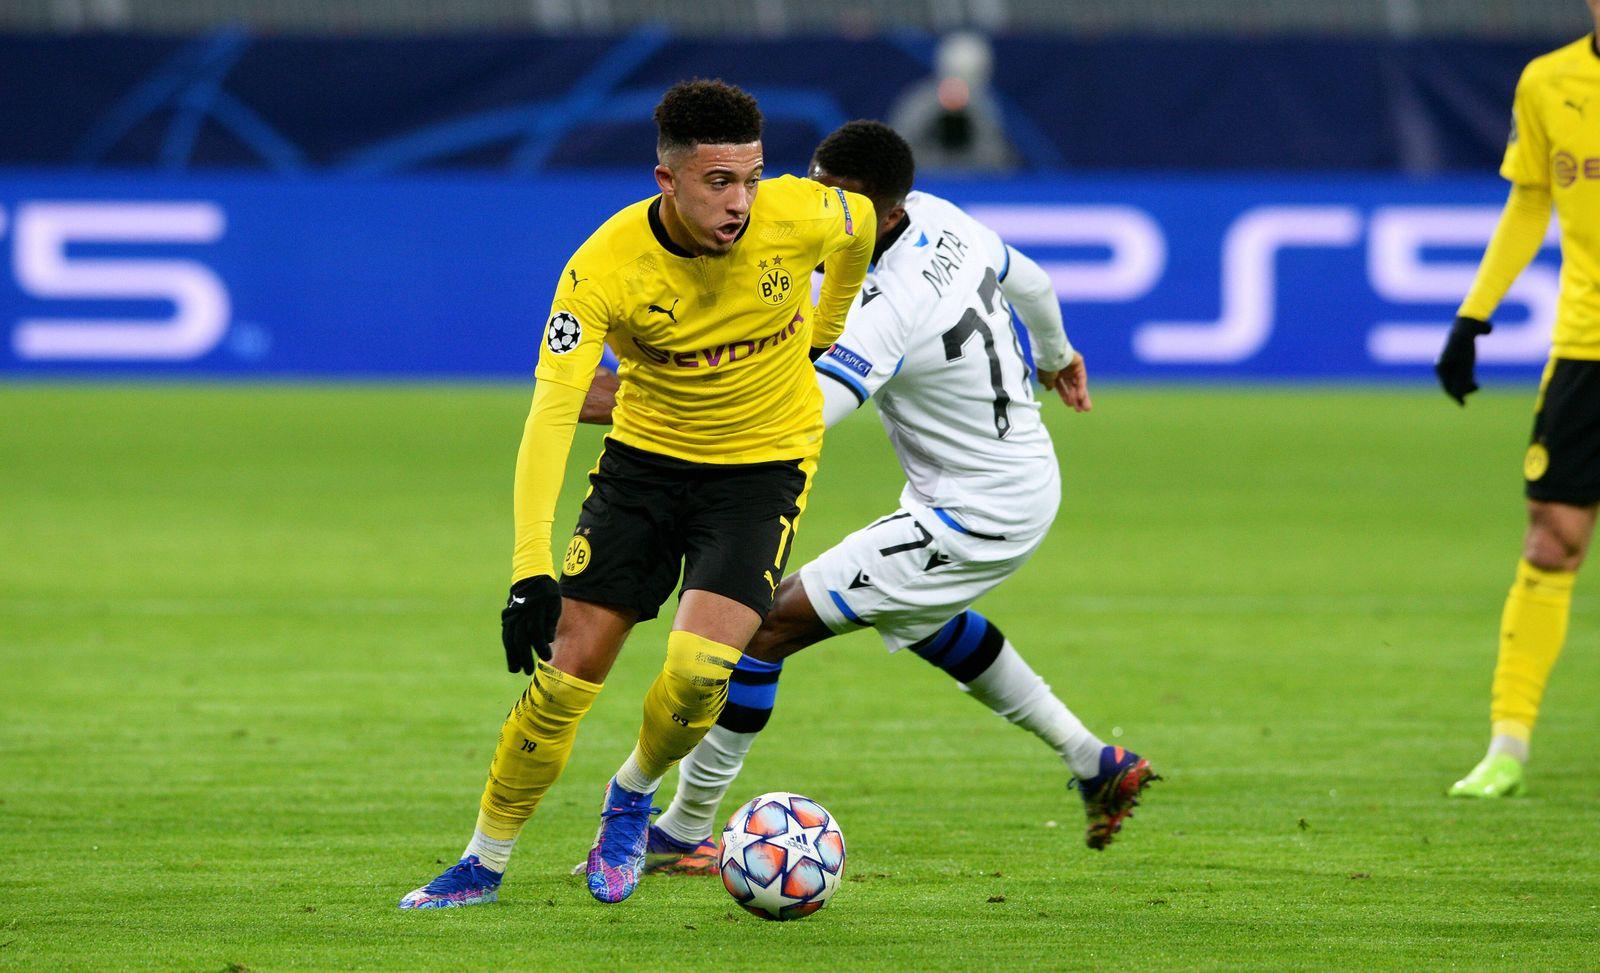 Fussball, UEFA Champions League, Herren, Saison 2020/2021, Gruppe F, 4. Spieltag, Signal Iduna Park Dortmund, Bor. Dort